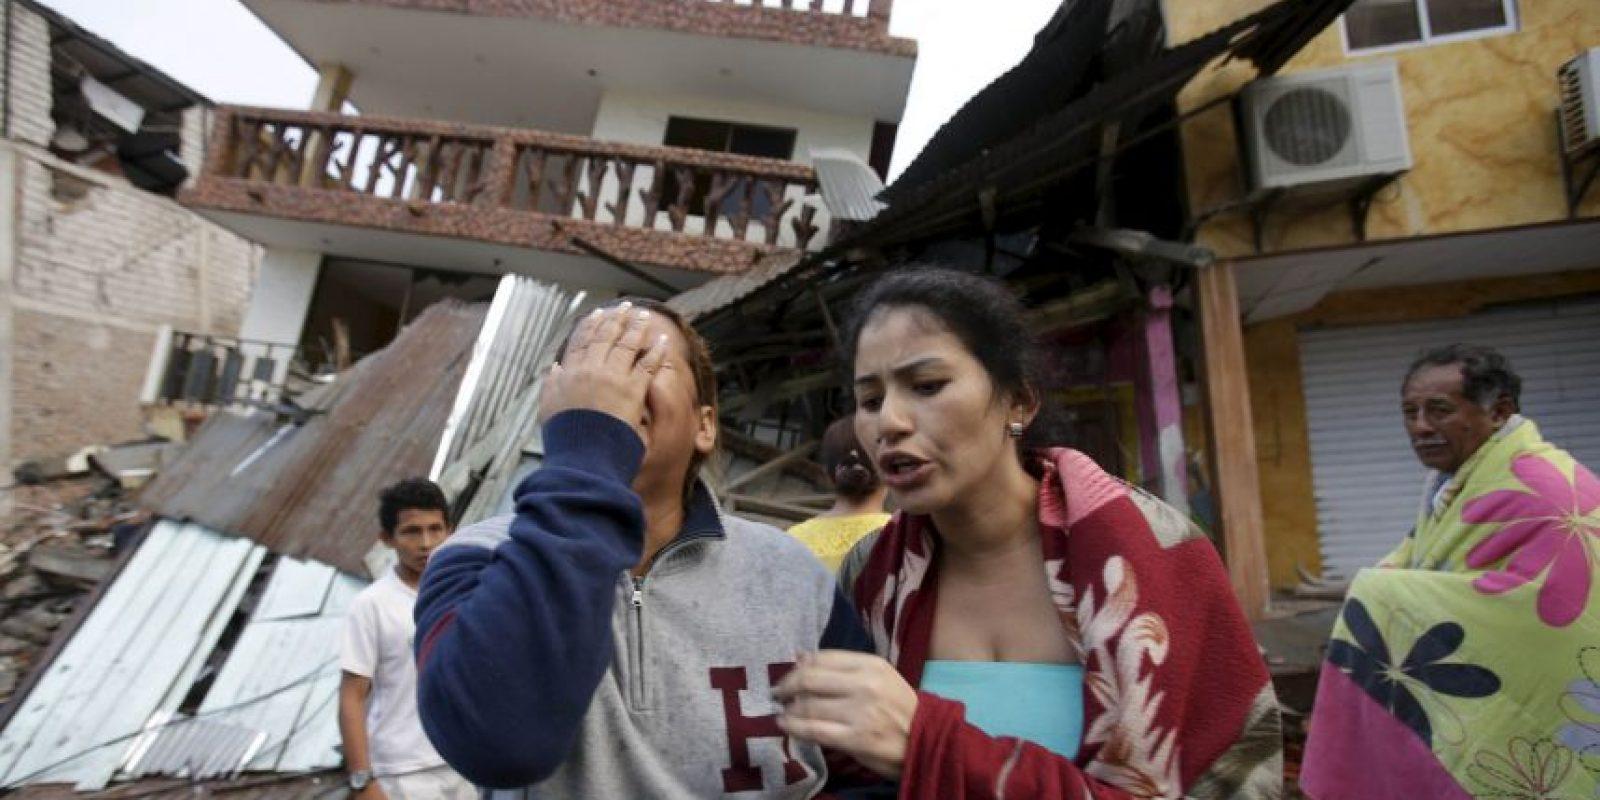 Así amaneció en Ecuador tras el sismo magnitud 7.8 que causó 77 muertes Foto:AP